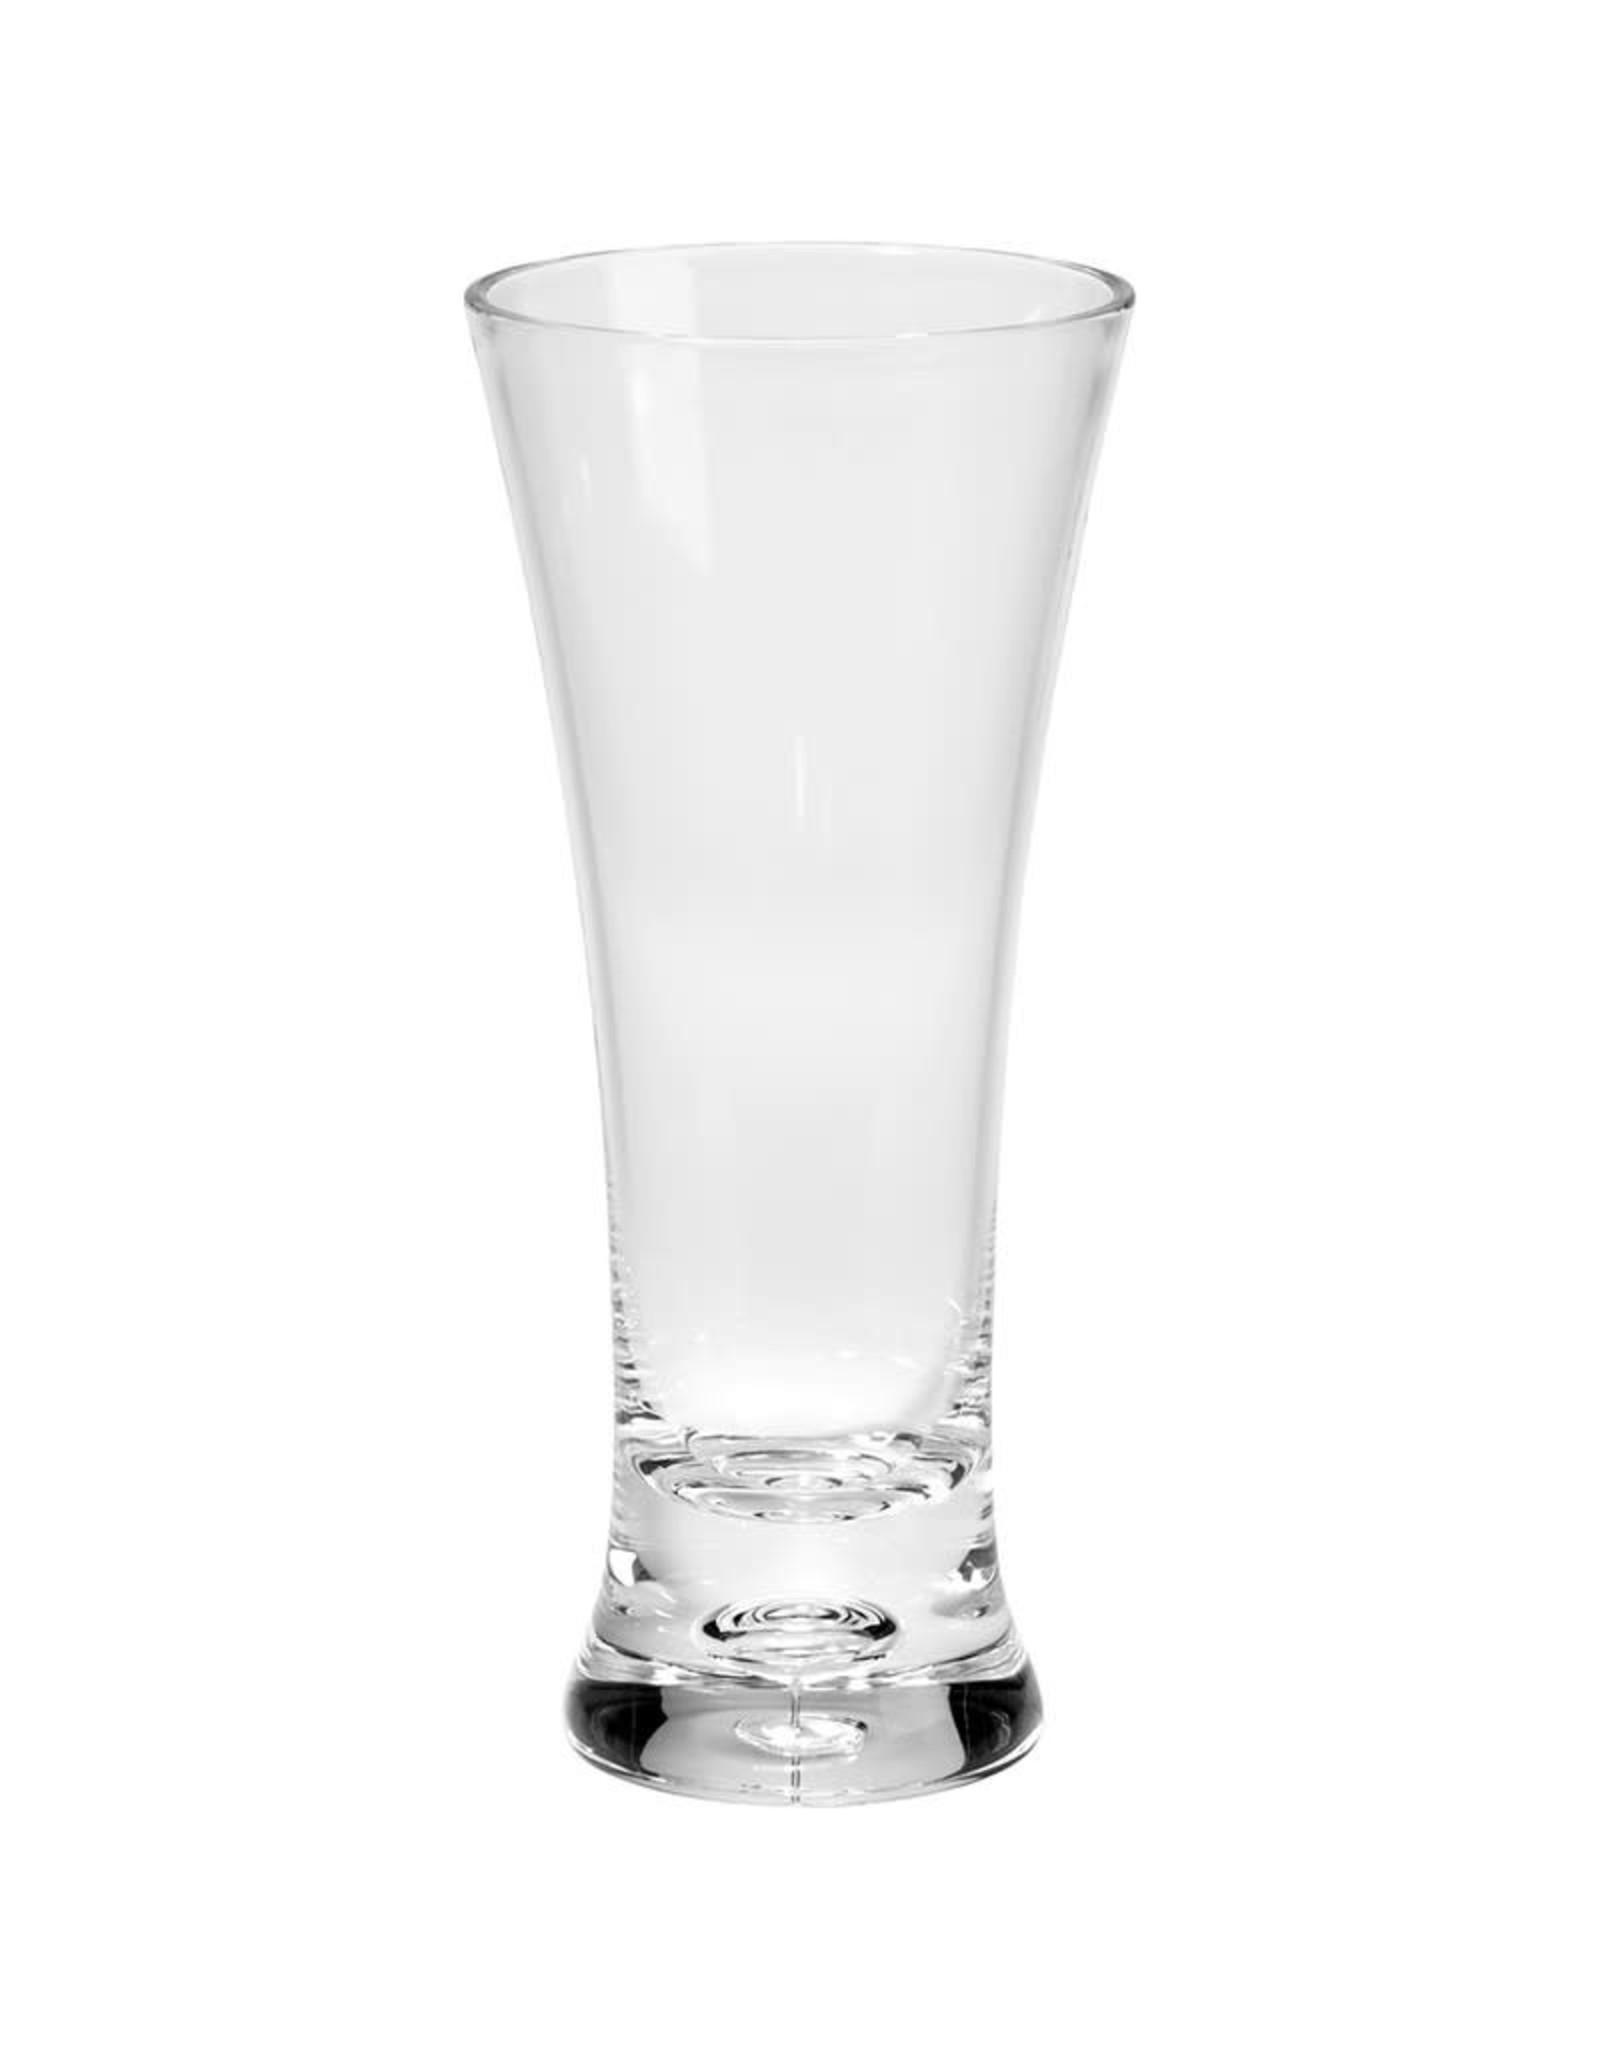 Merritt International Acrylic Jewel Clear Pilsner Glass 12oz